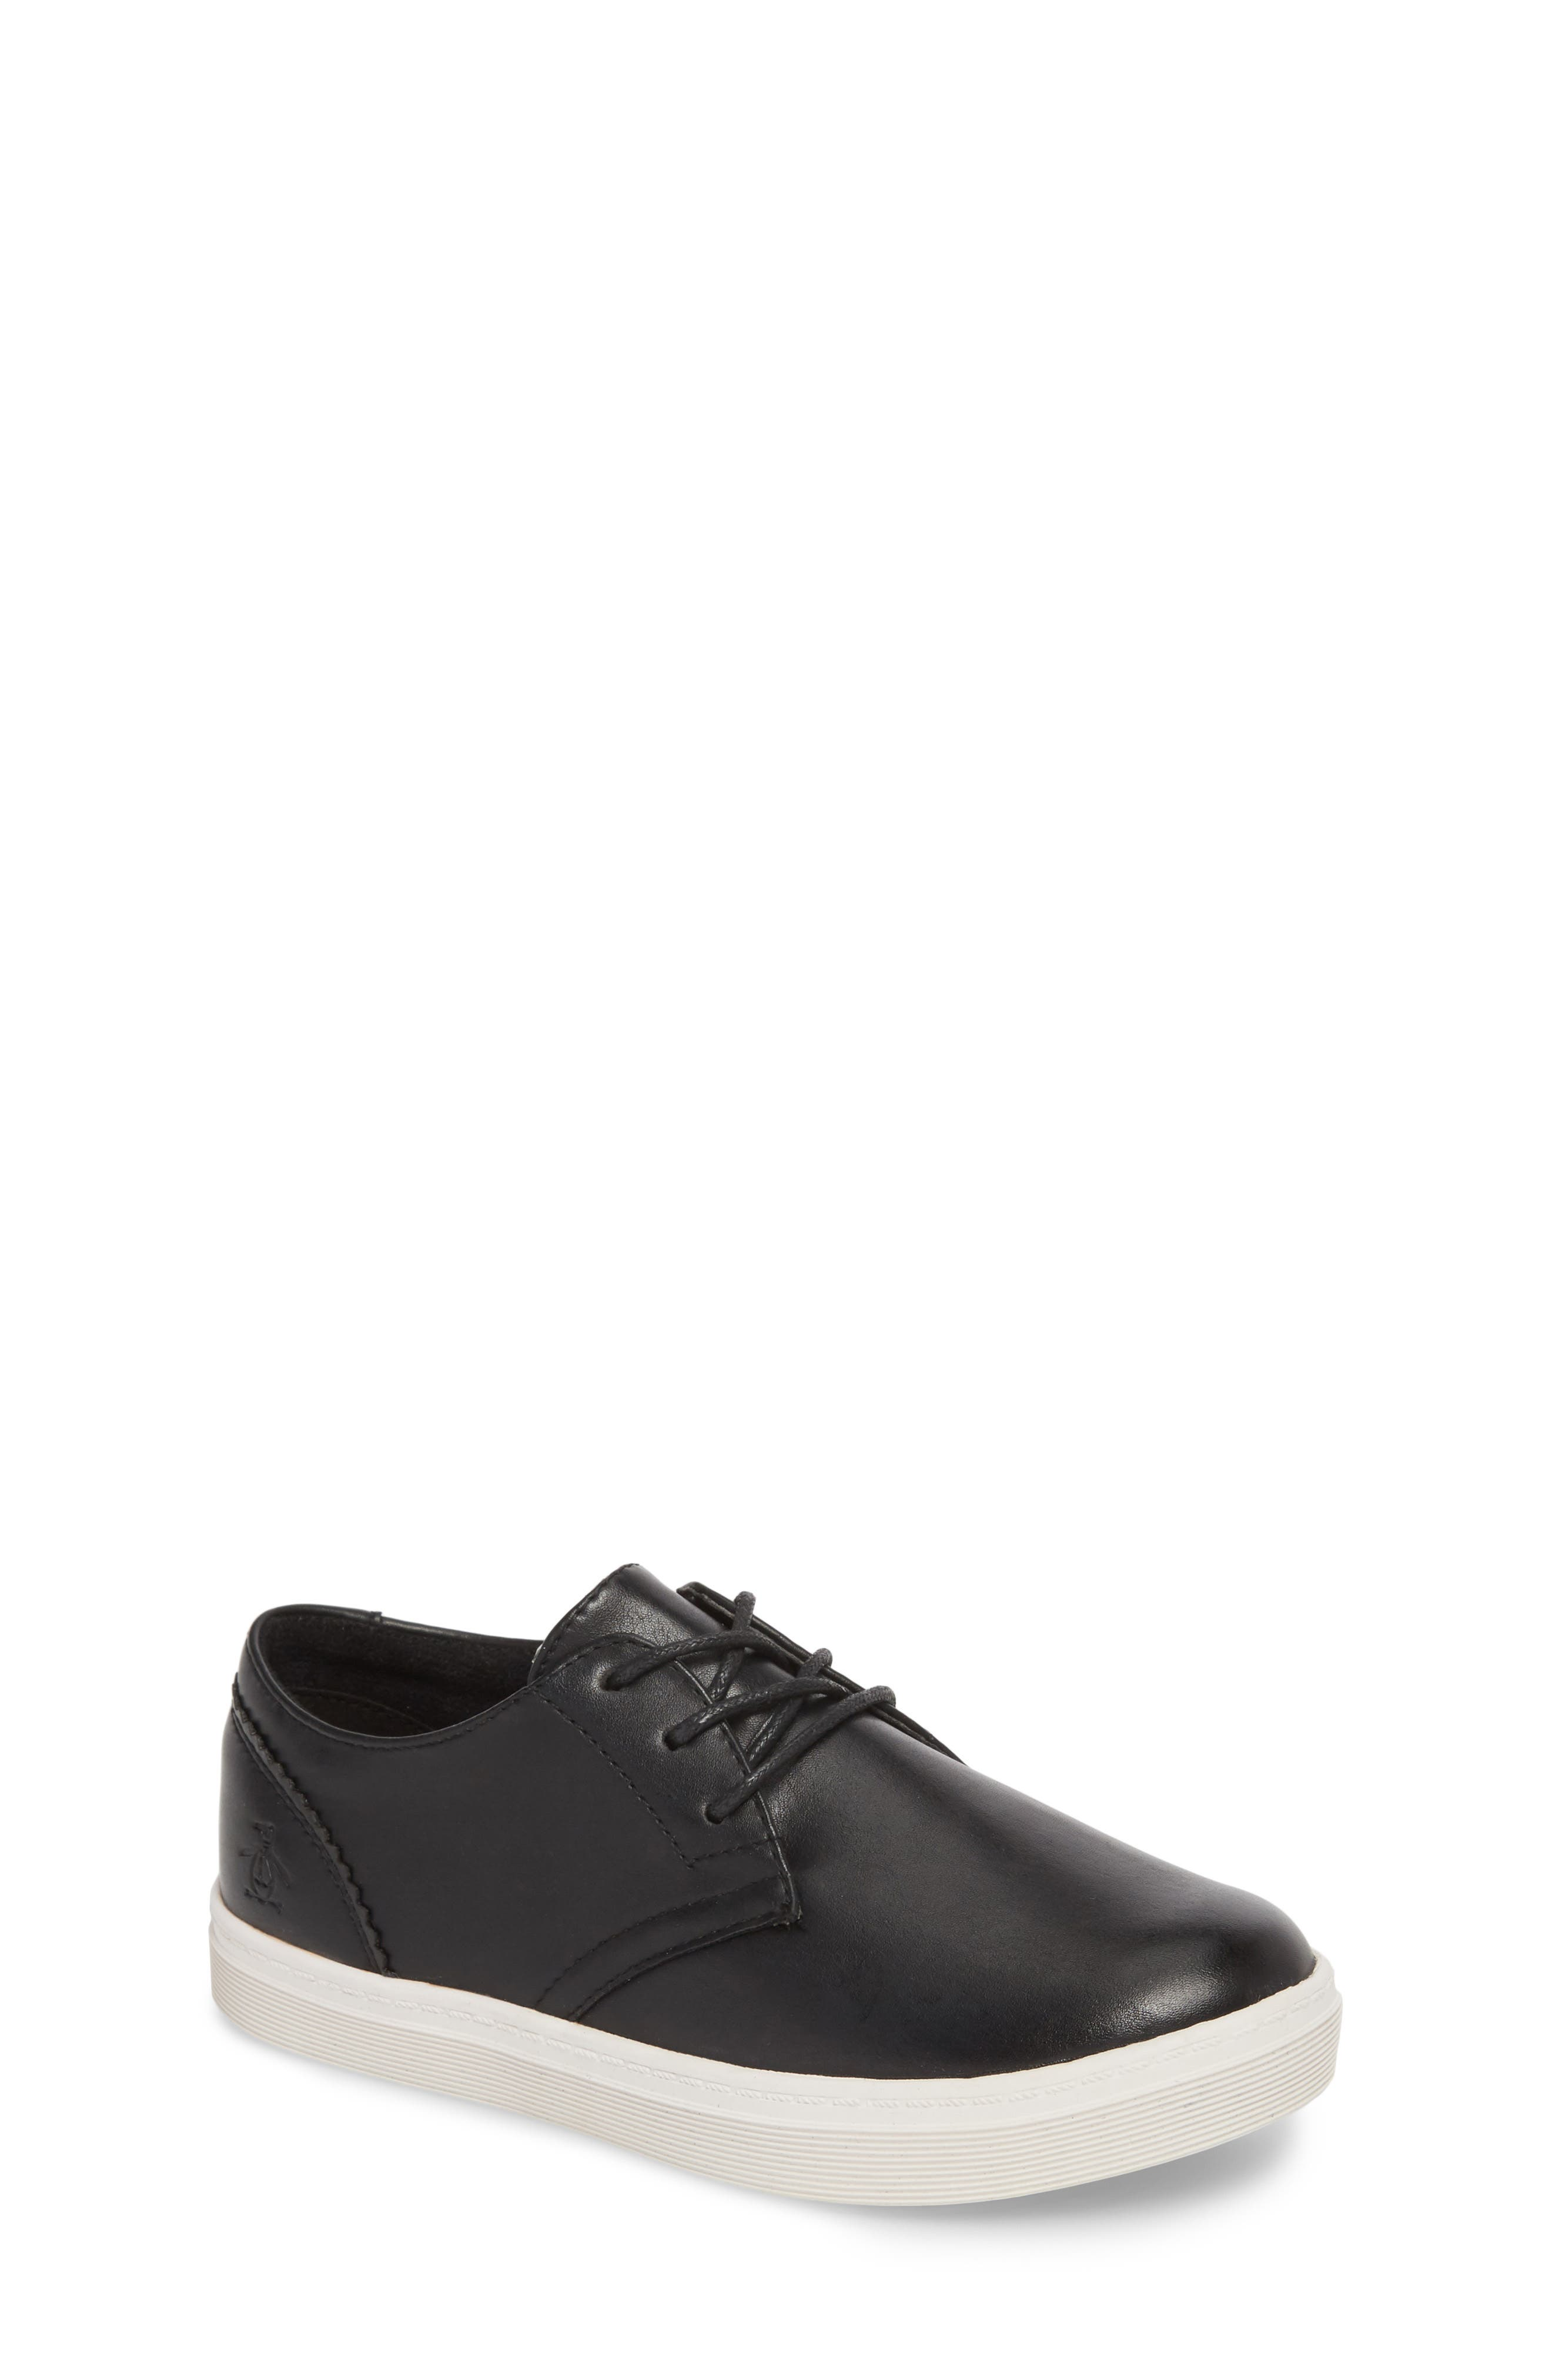 Freeland Sneaker,                         Main,                         color, Black